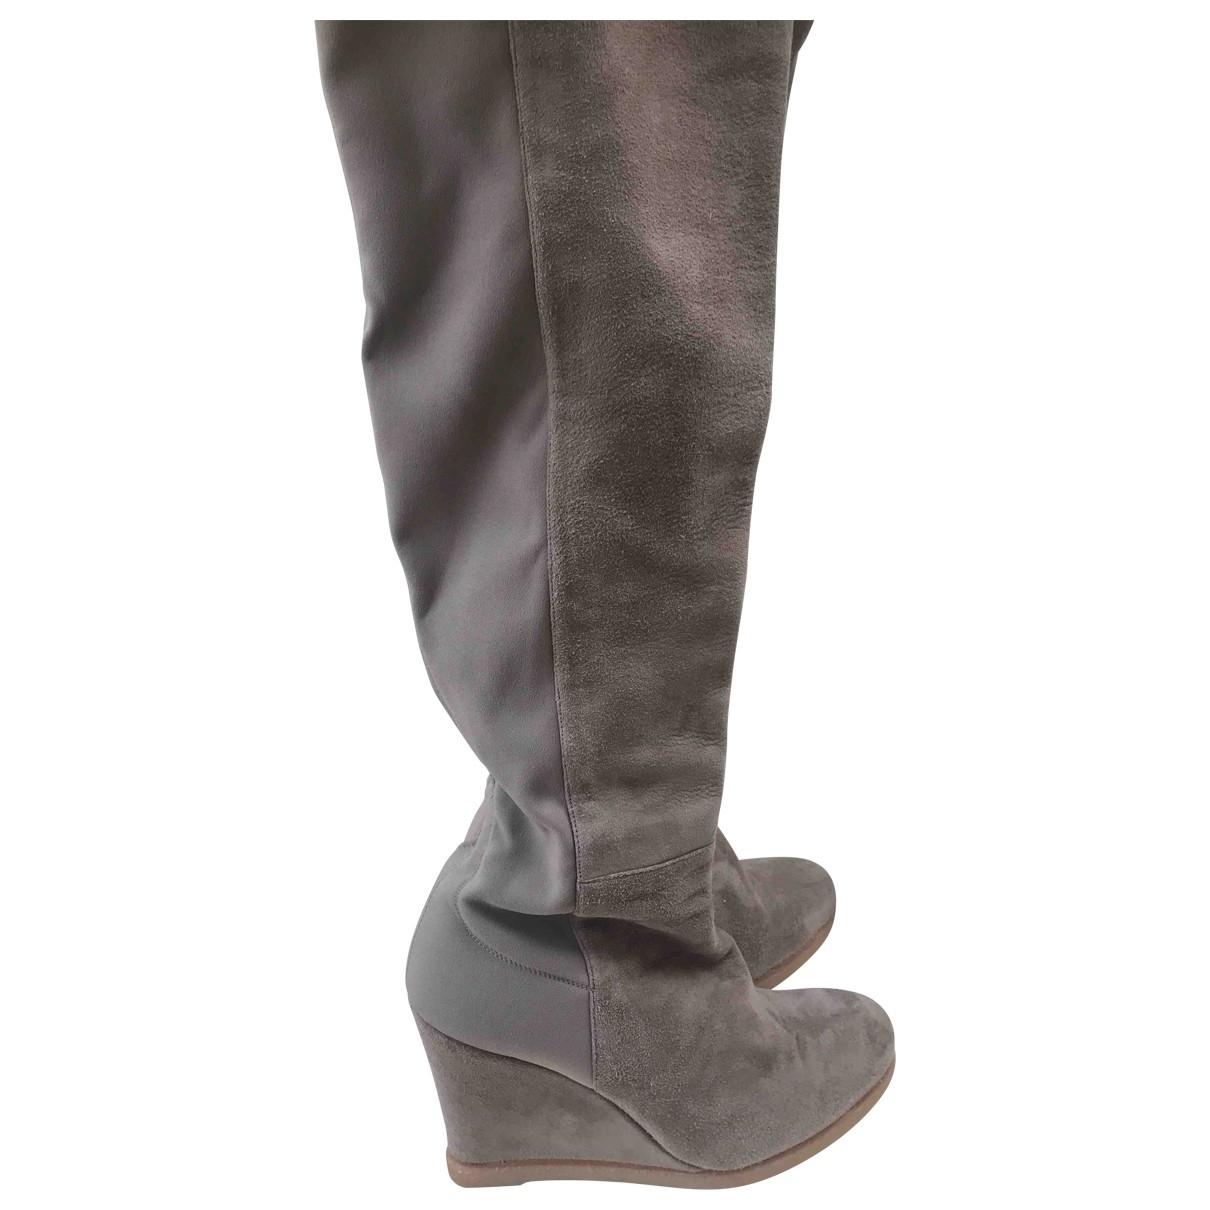 Stuart Weitzman N Beige Leather Boots for Women 41 EU